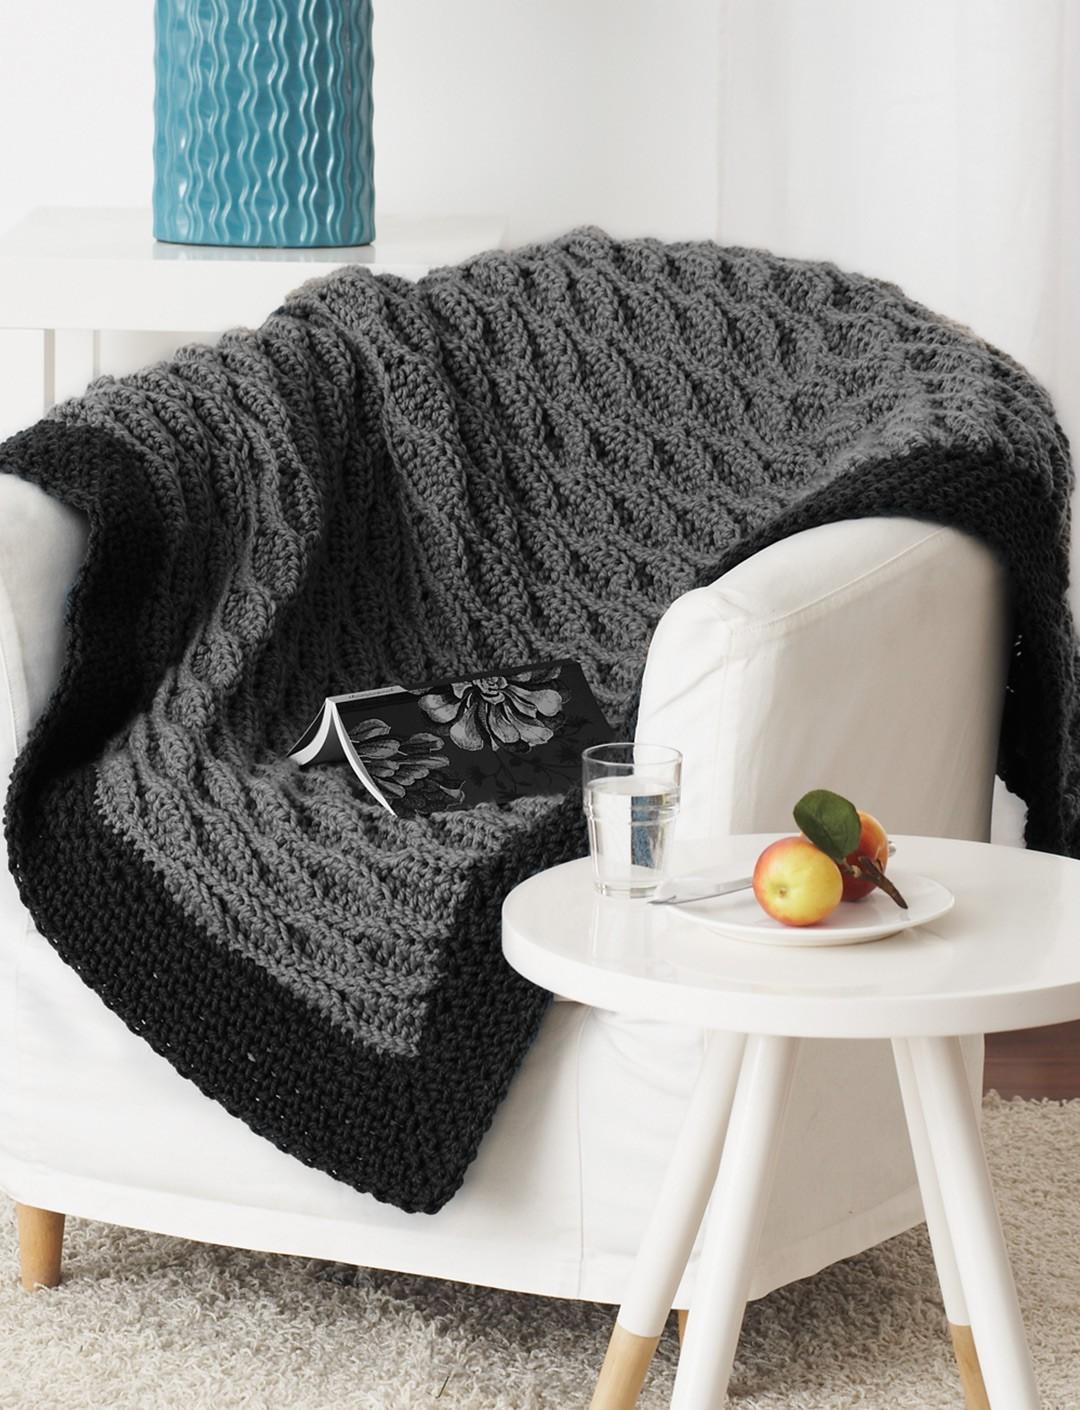 bernat patterns quick u0026 easy blanket yvzelhn